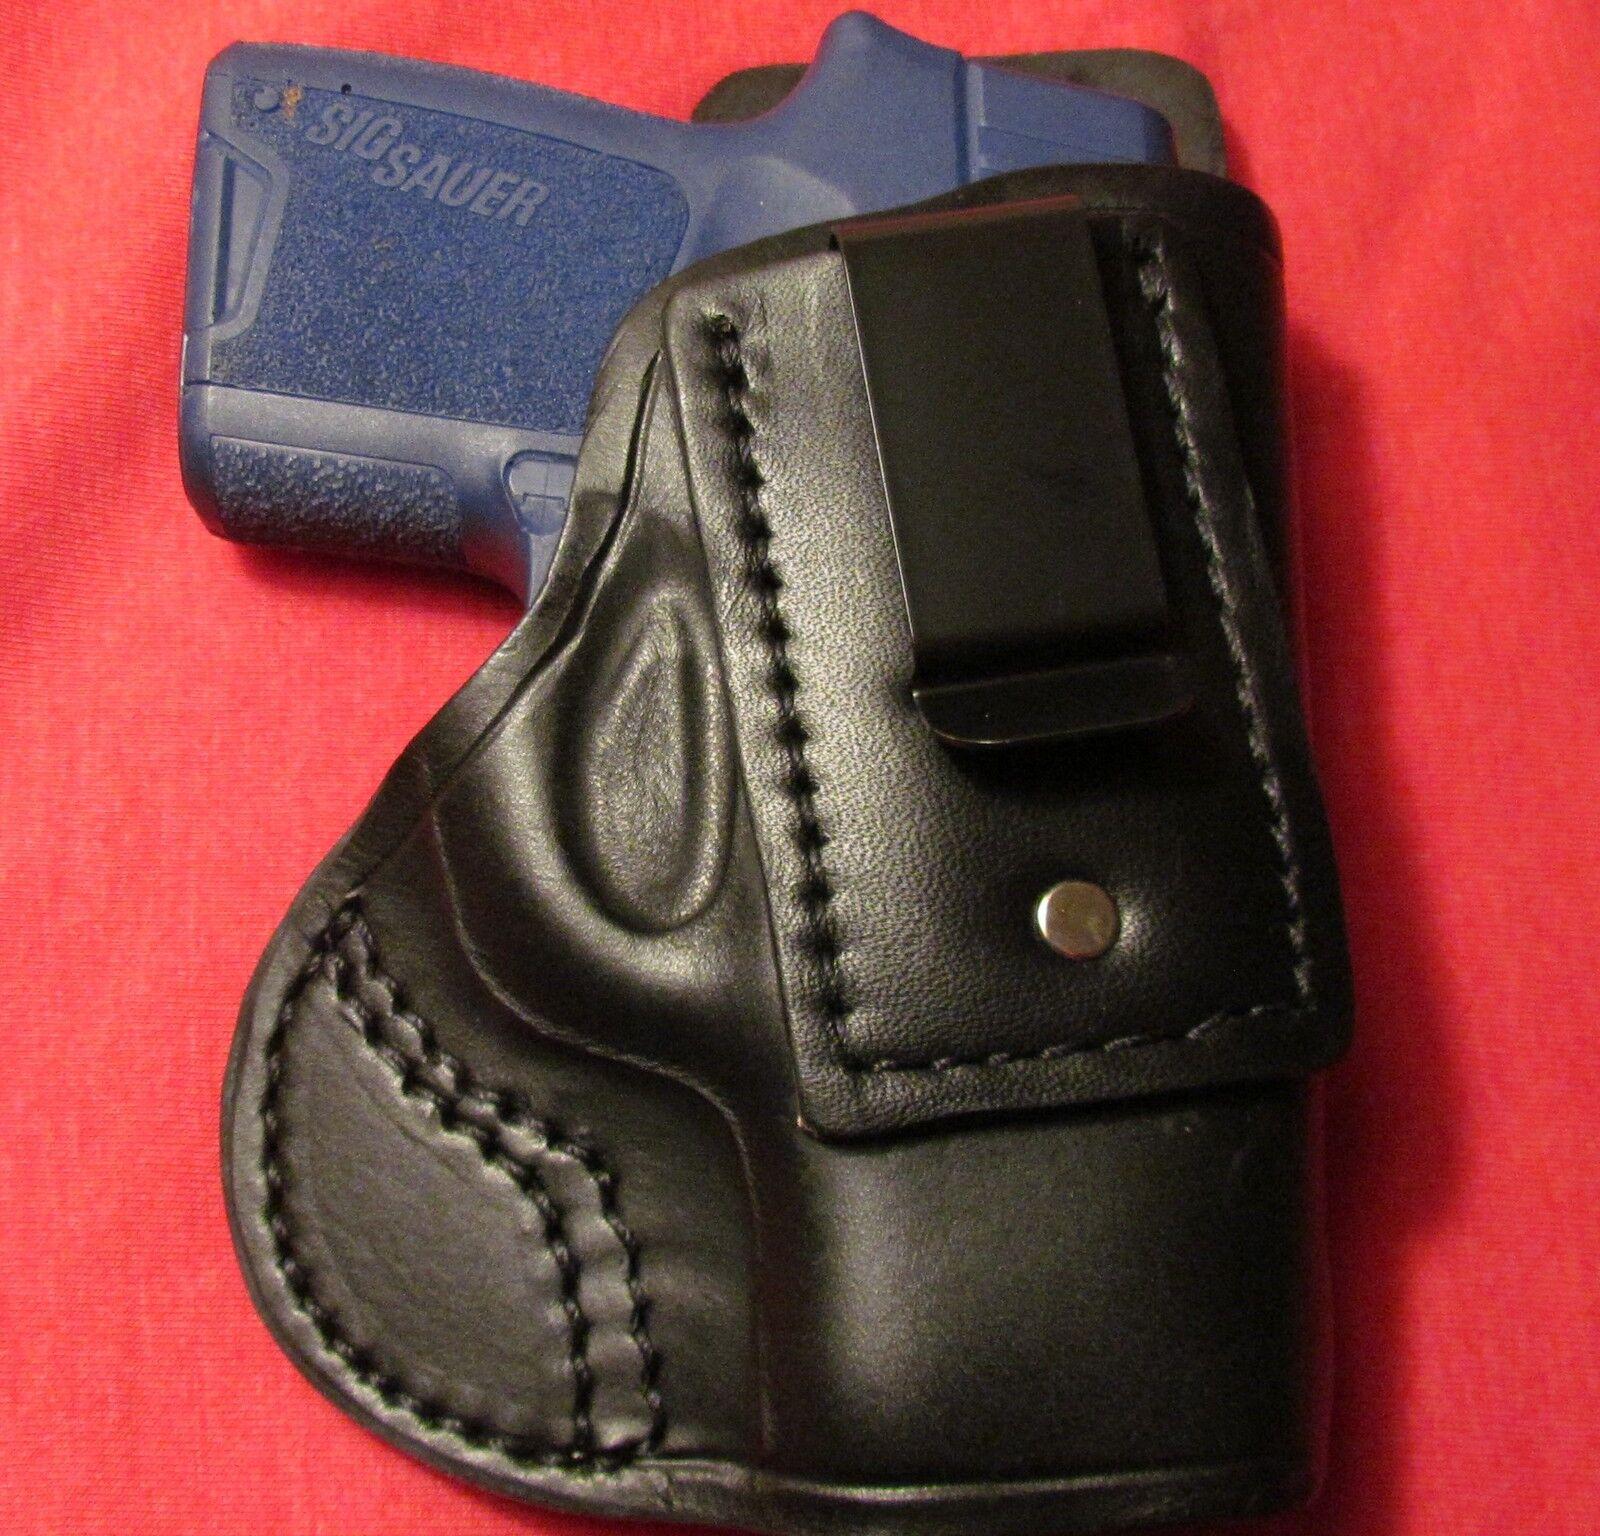 & Wesson M&P M&P M&P Shield dentro Smith la funda de la cintura 201b93